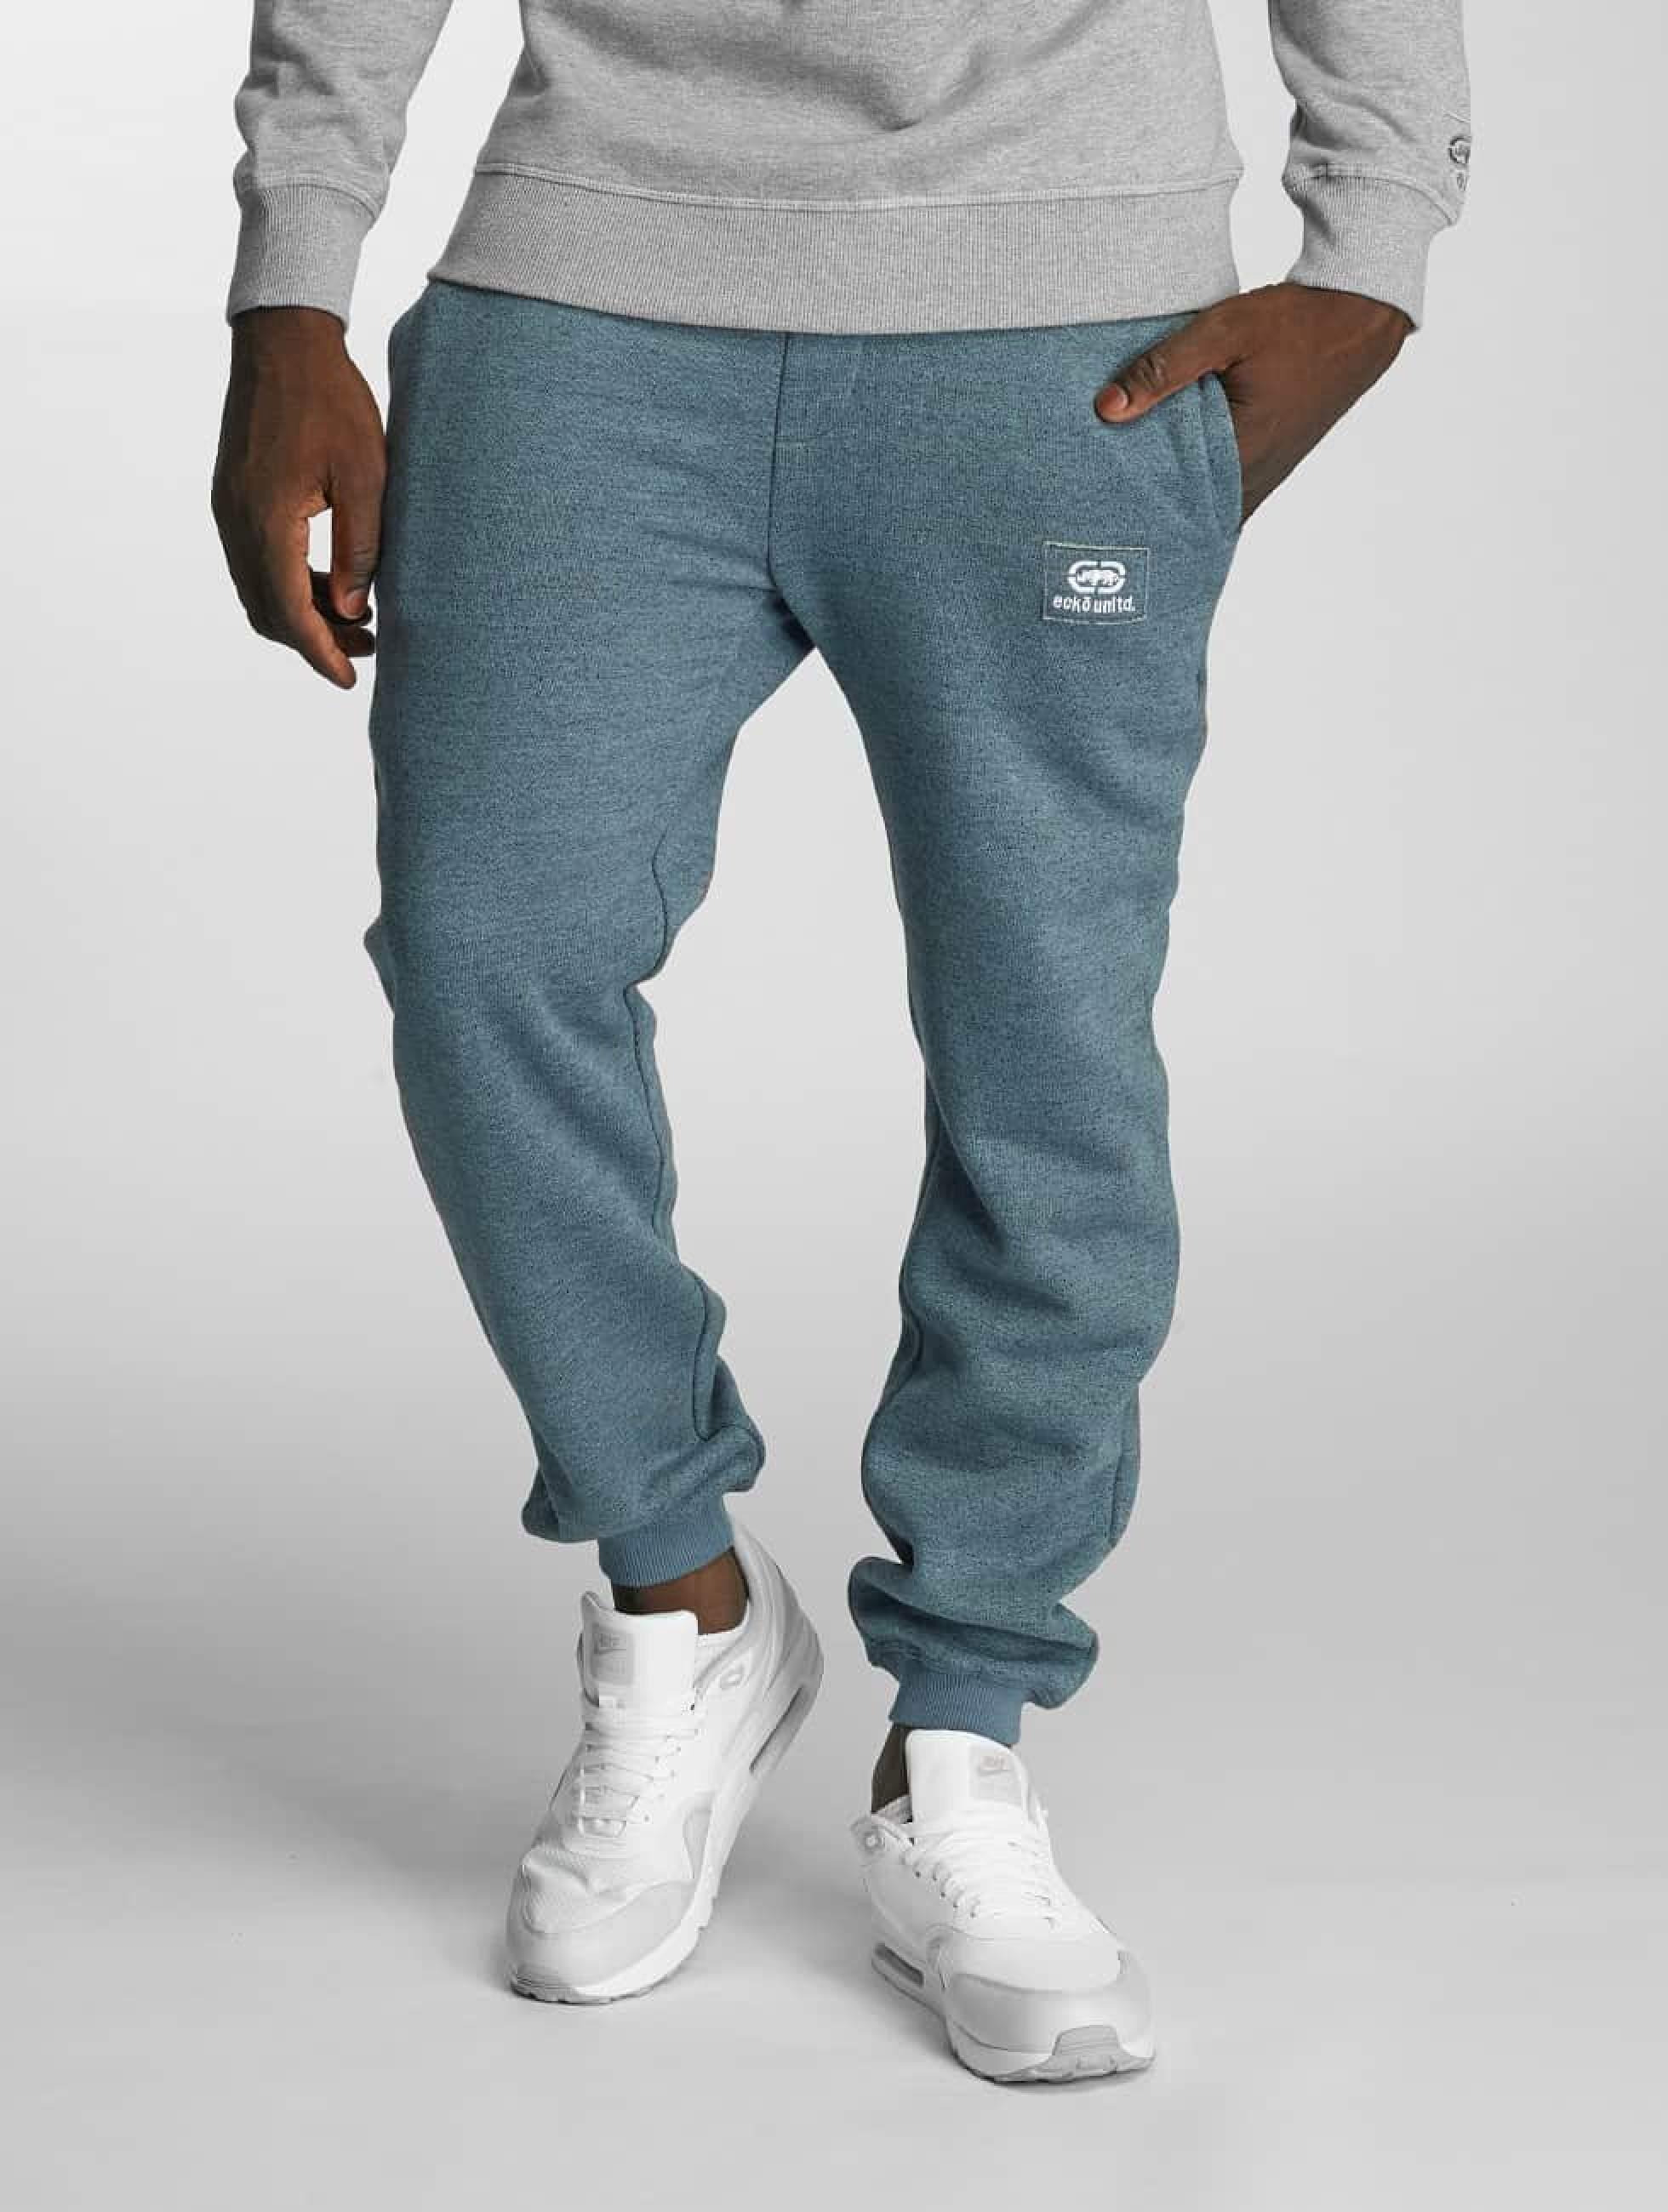 Ecko Unltd. / Sweat Pant Stormz in blue 2XL